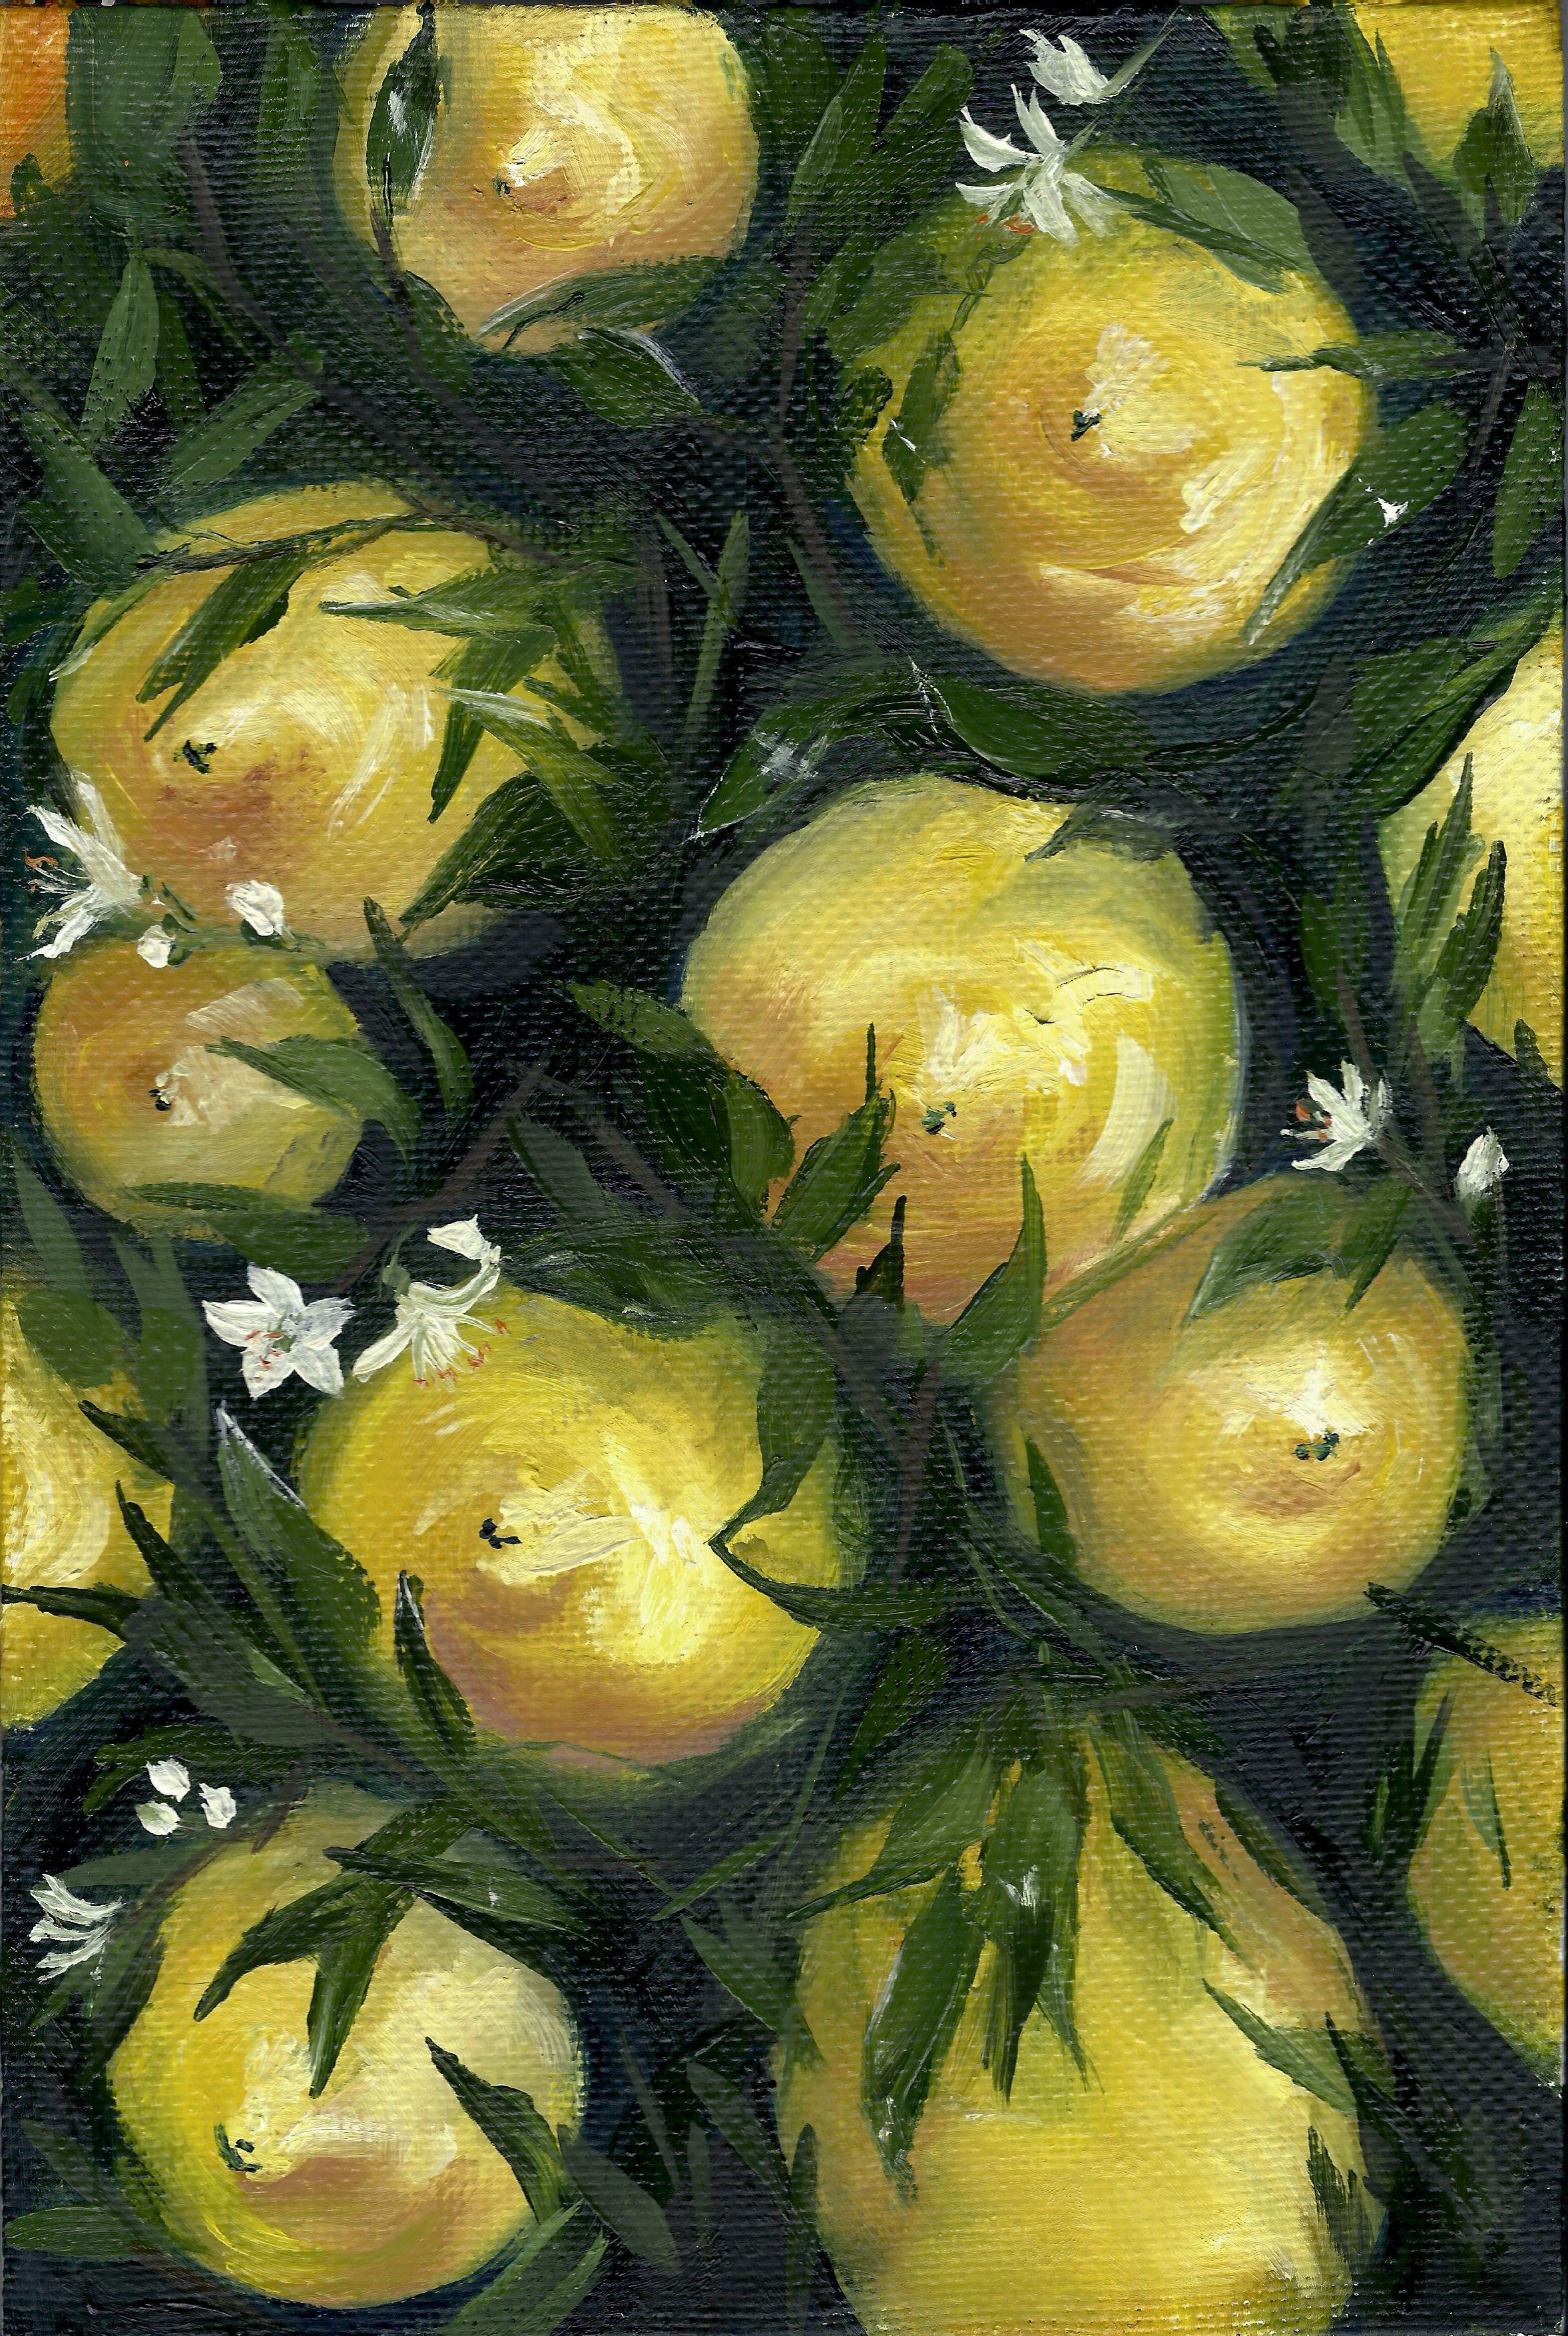 43 Zitrone Ideen Zitrone Stillleben Malerei